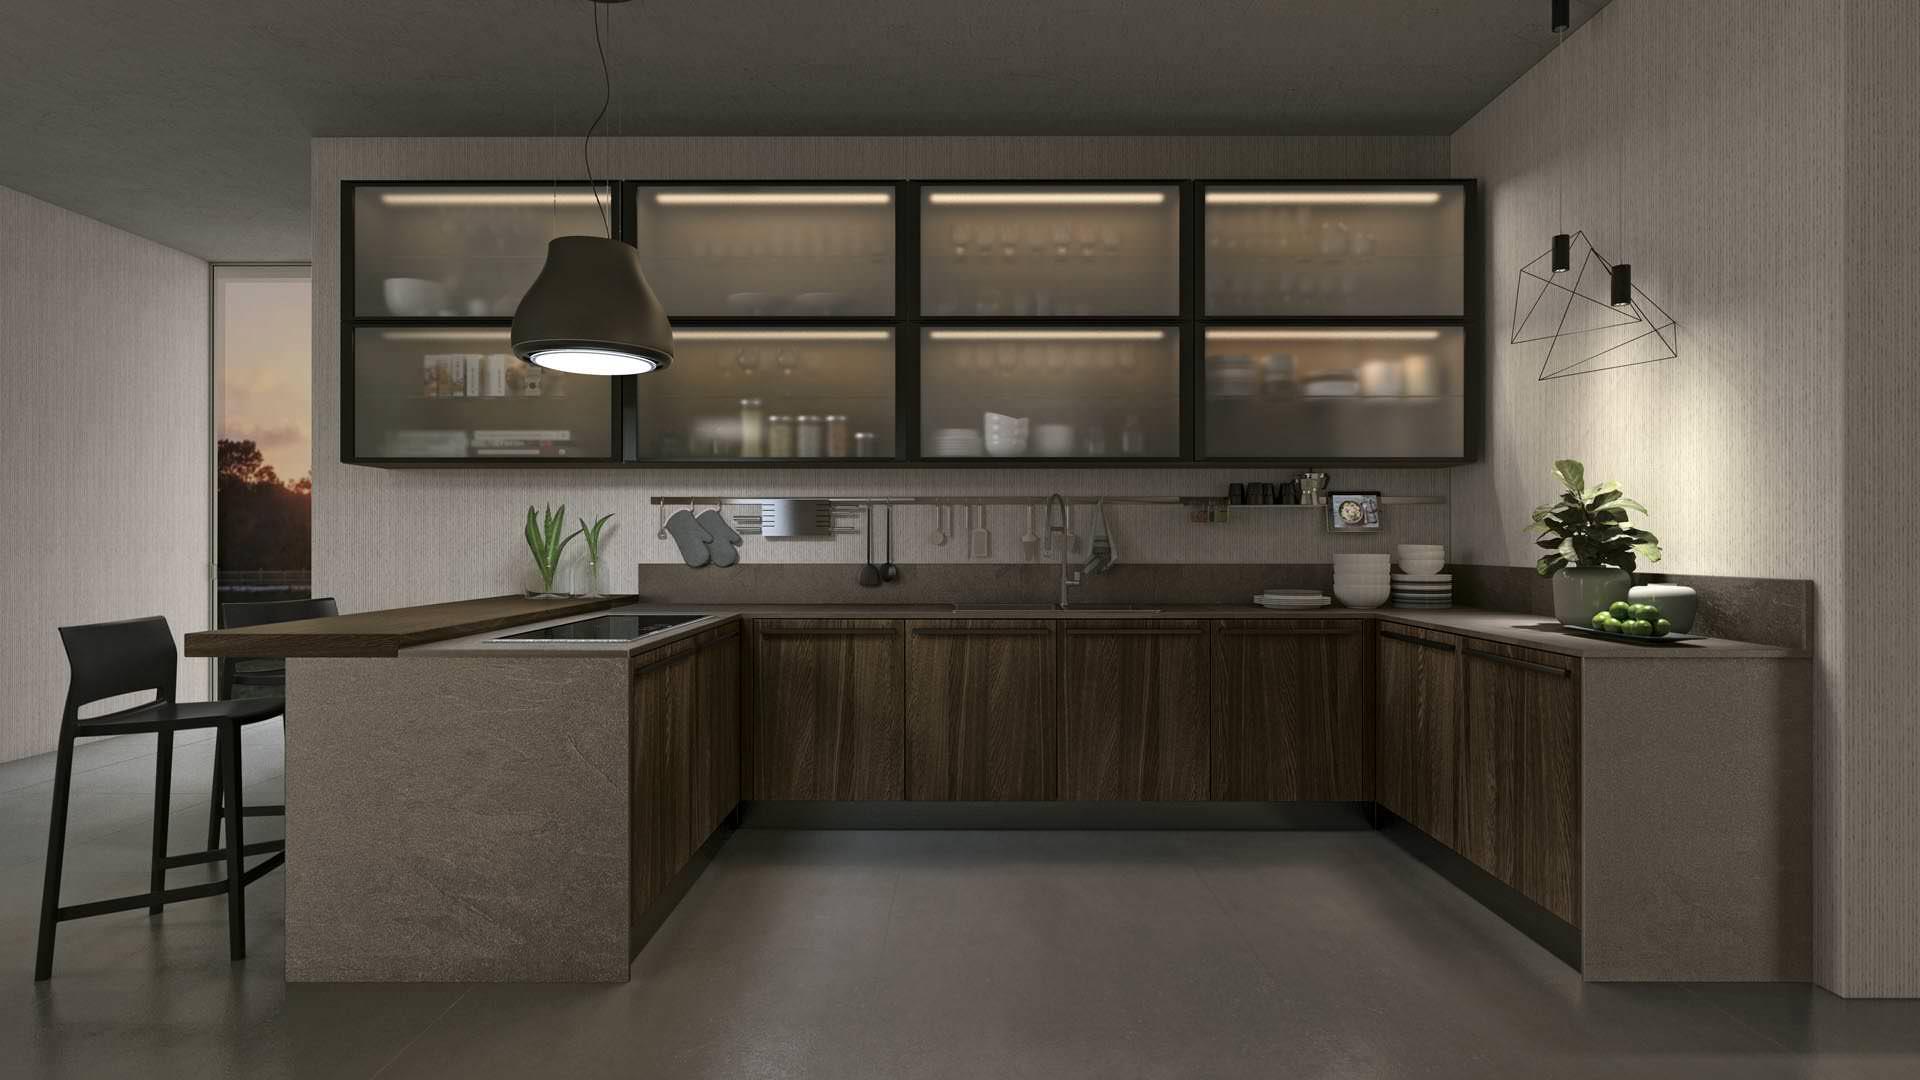 I colori in cucina le tonalit da scegliere in base al for Cucine moderne scure